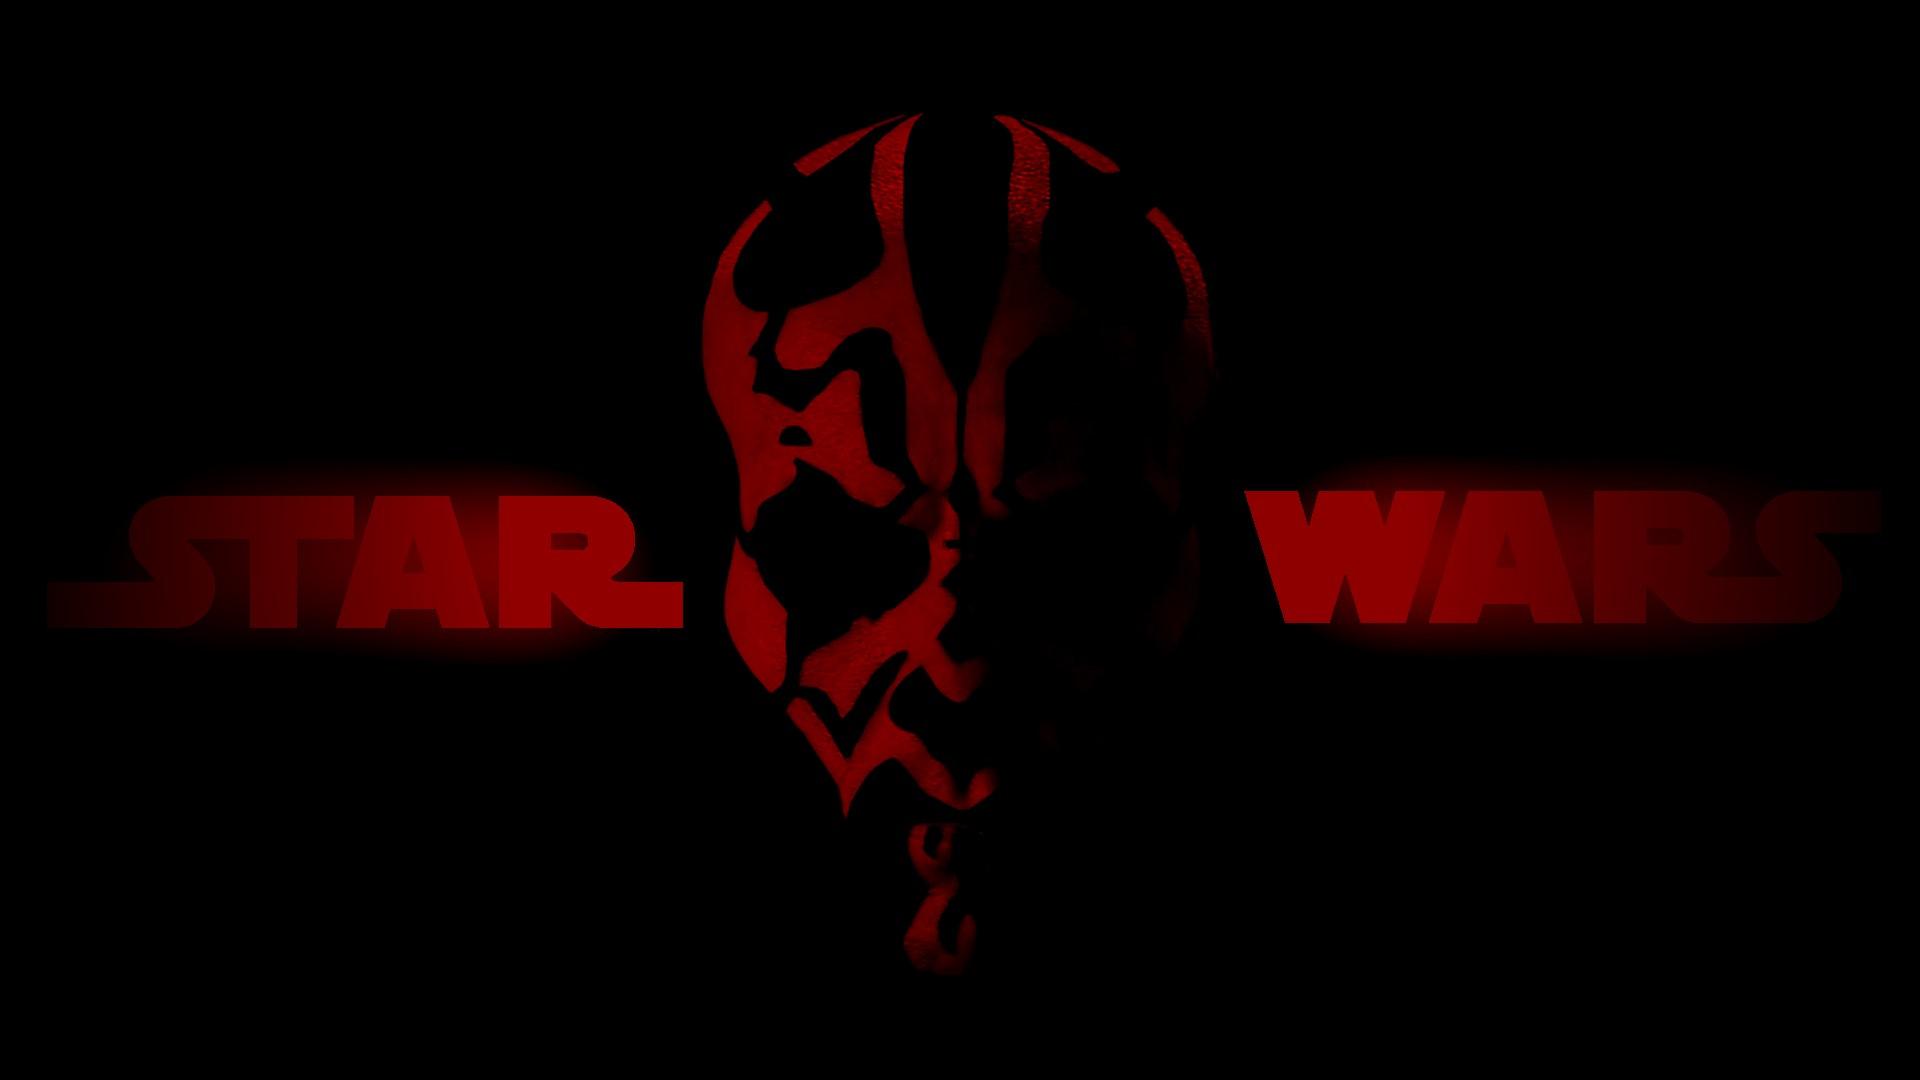 Darth Maul Star Wars Wallpaper Hd By Overlourd9 On Deviantart